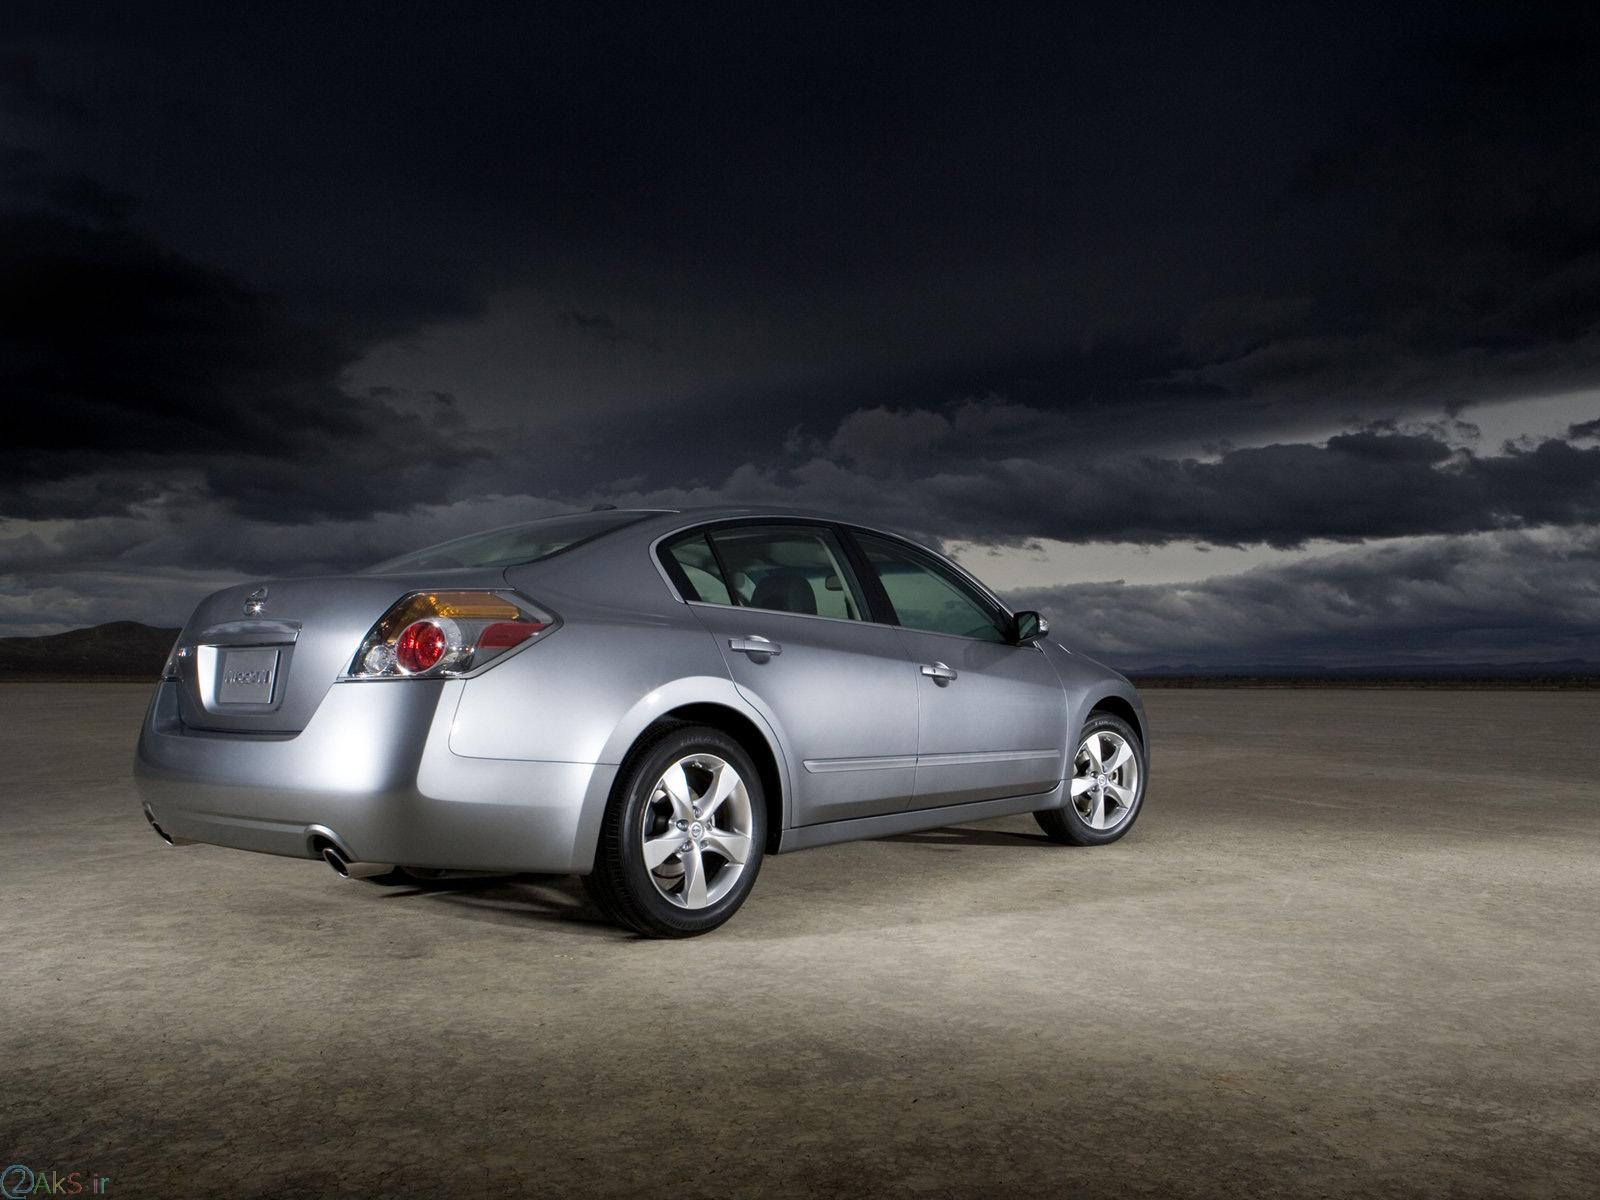 nhkg,n Nissan Altima